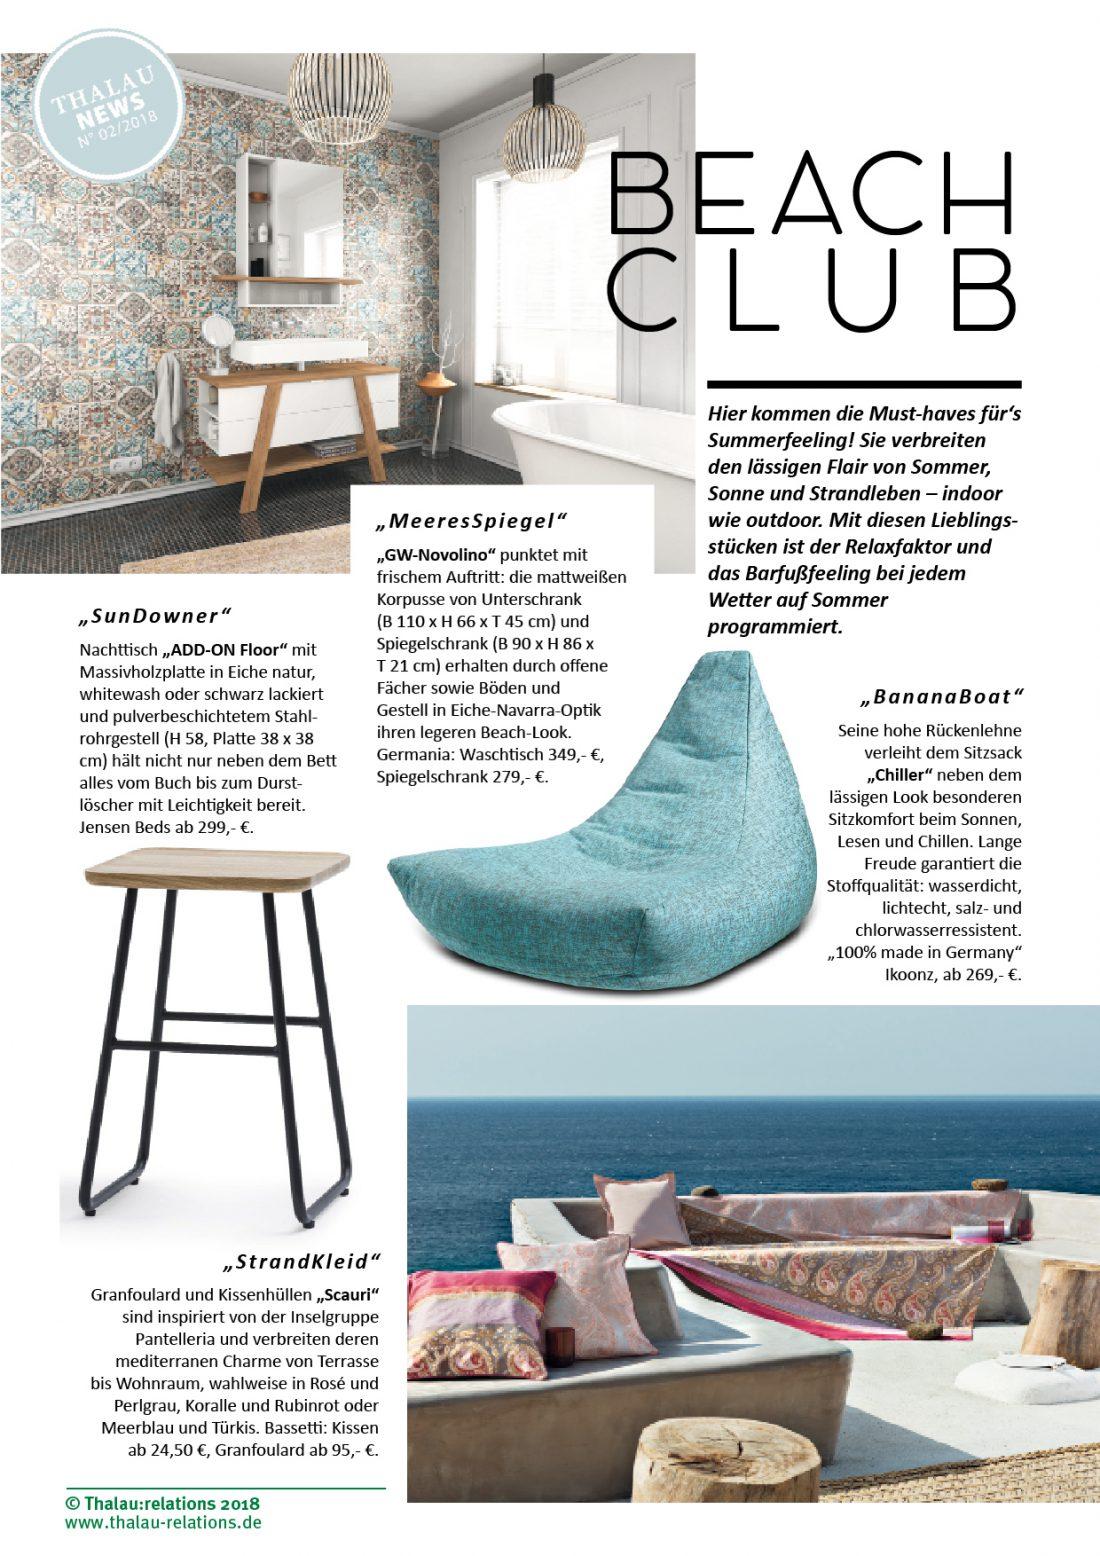 Thalau Newsletter Beach Club März 2018